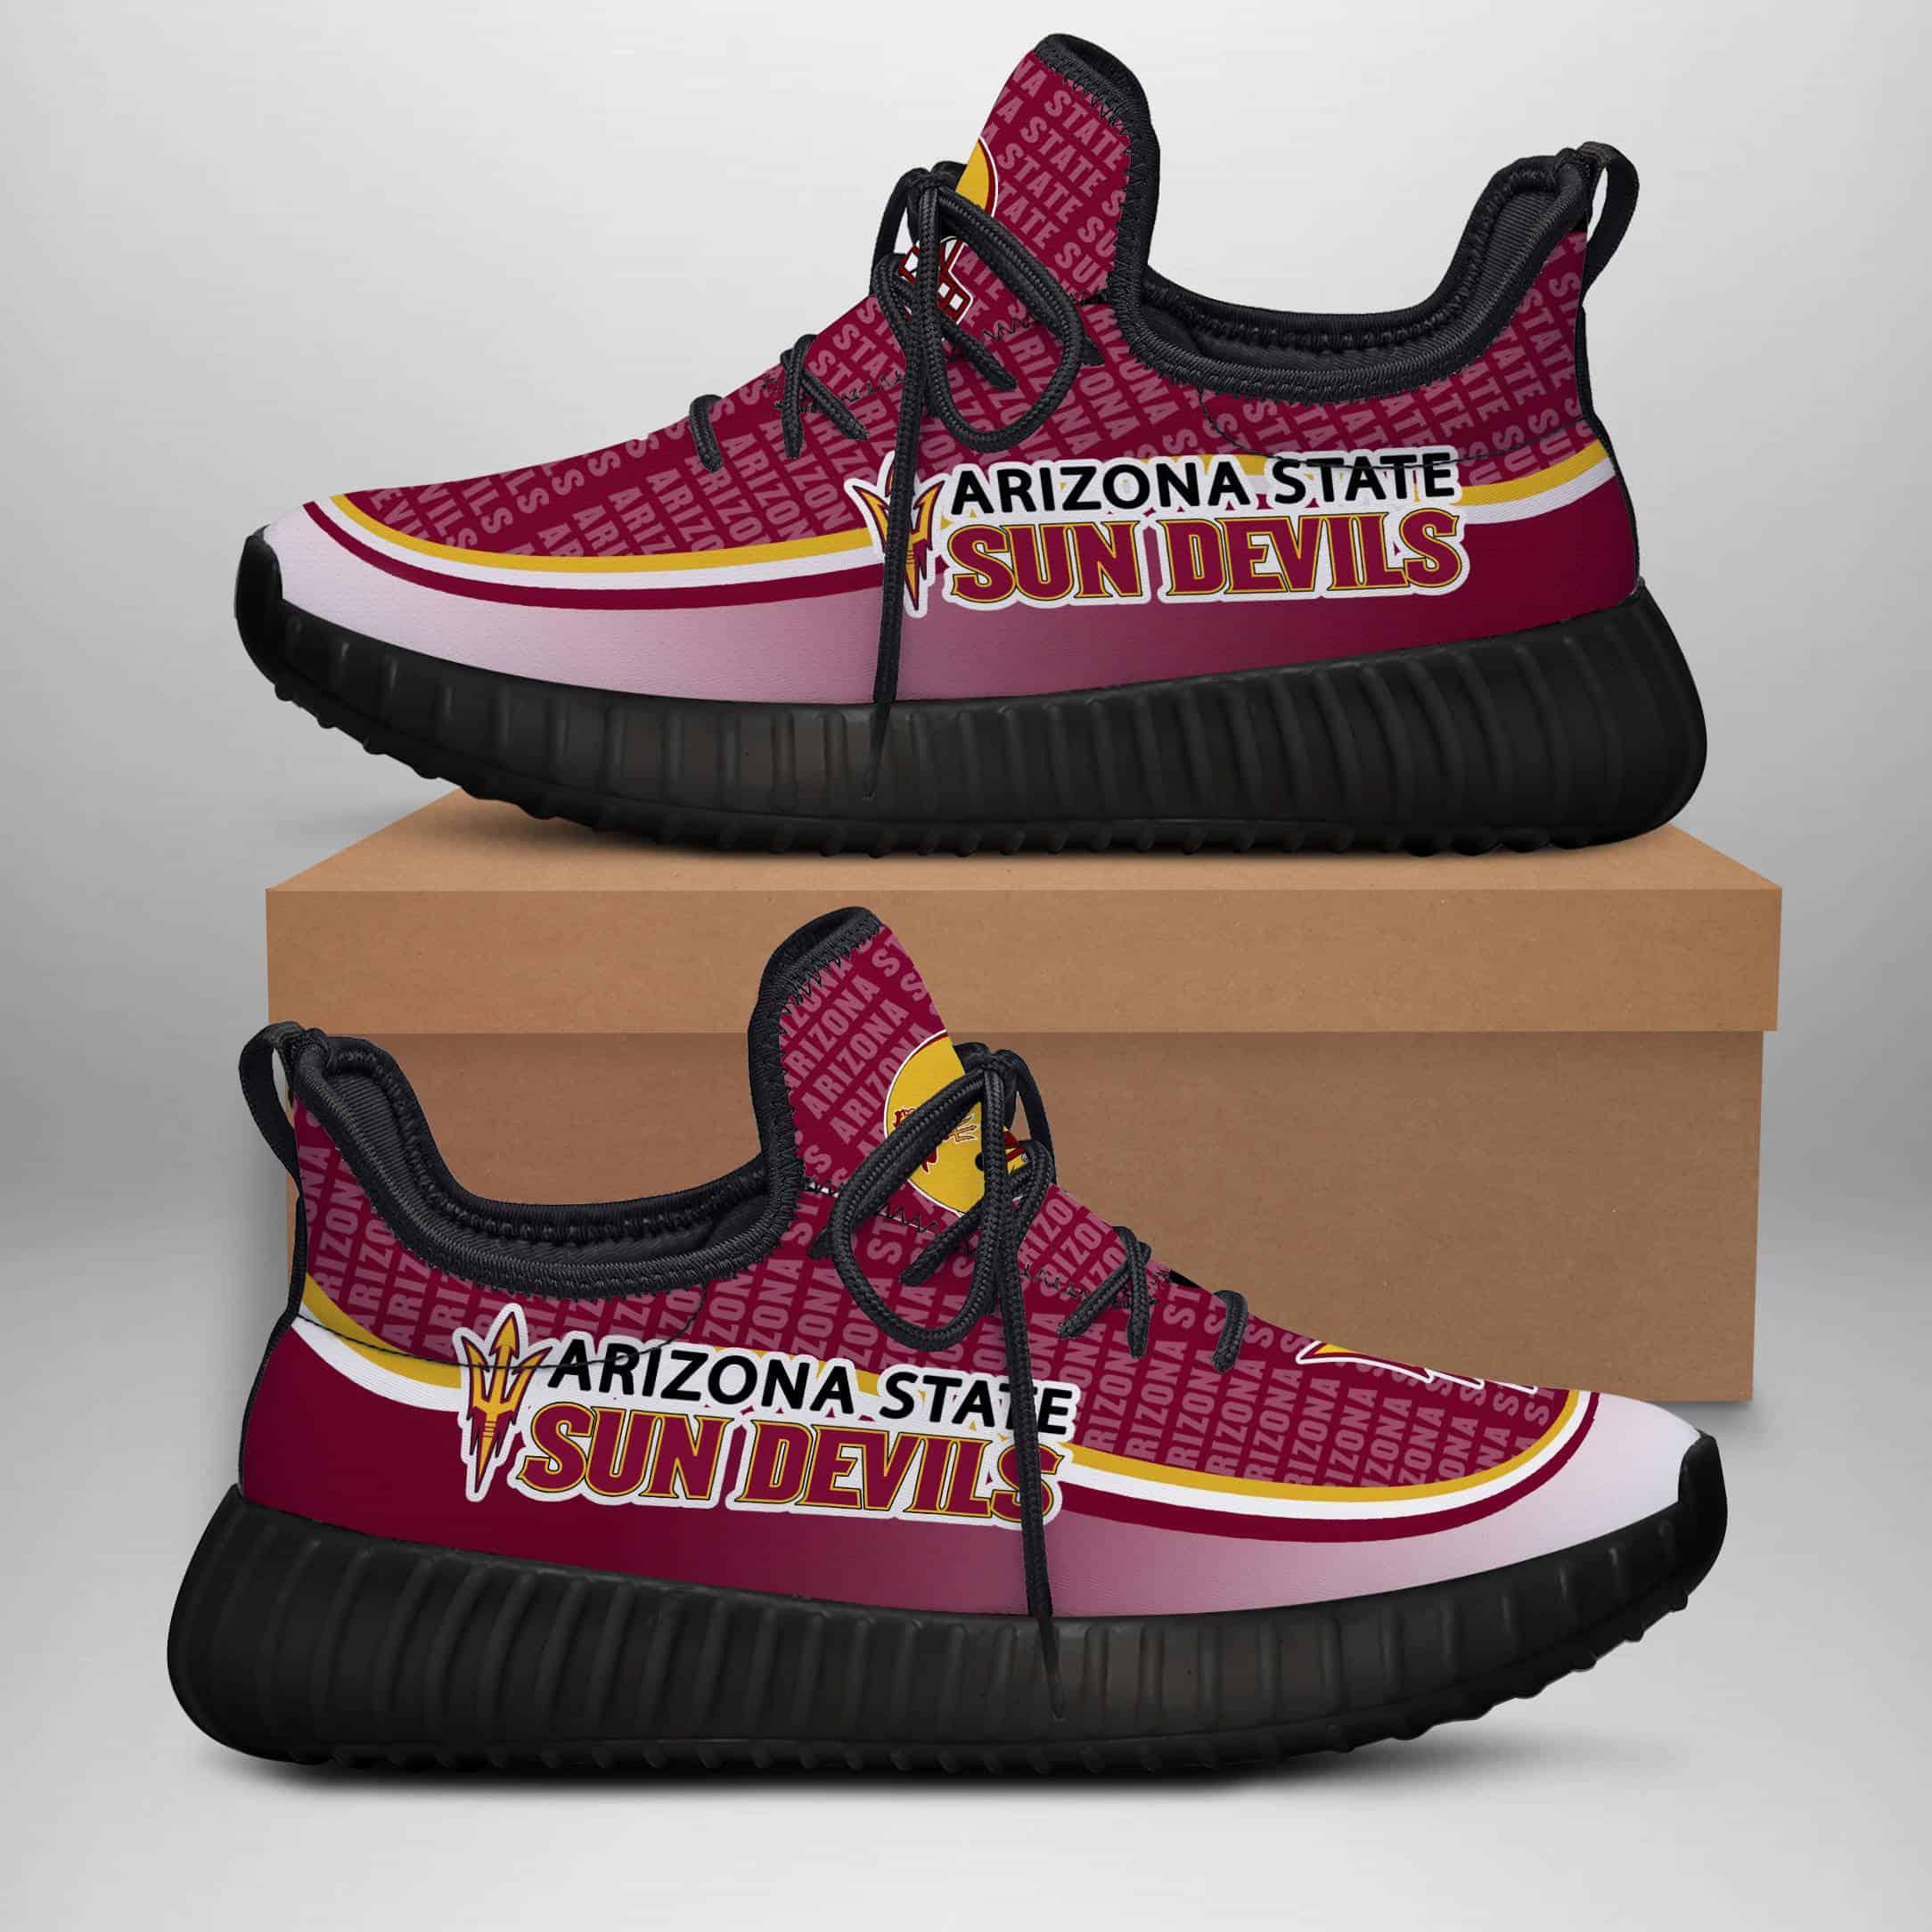 Arizona State Sun Devils Custom New Yeezy Sneaker